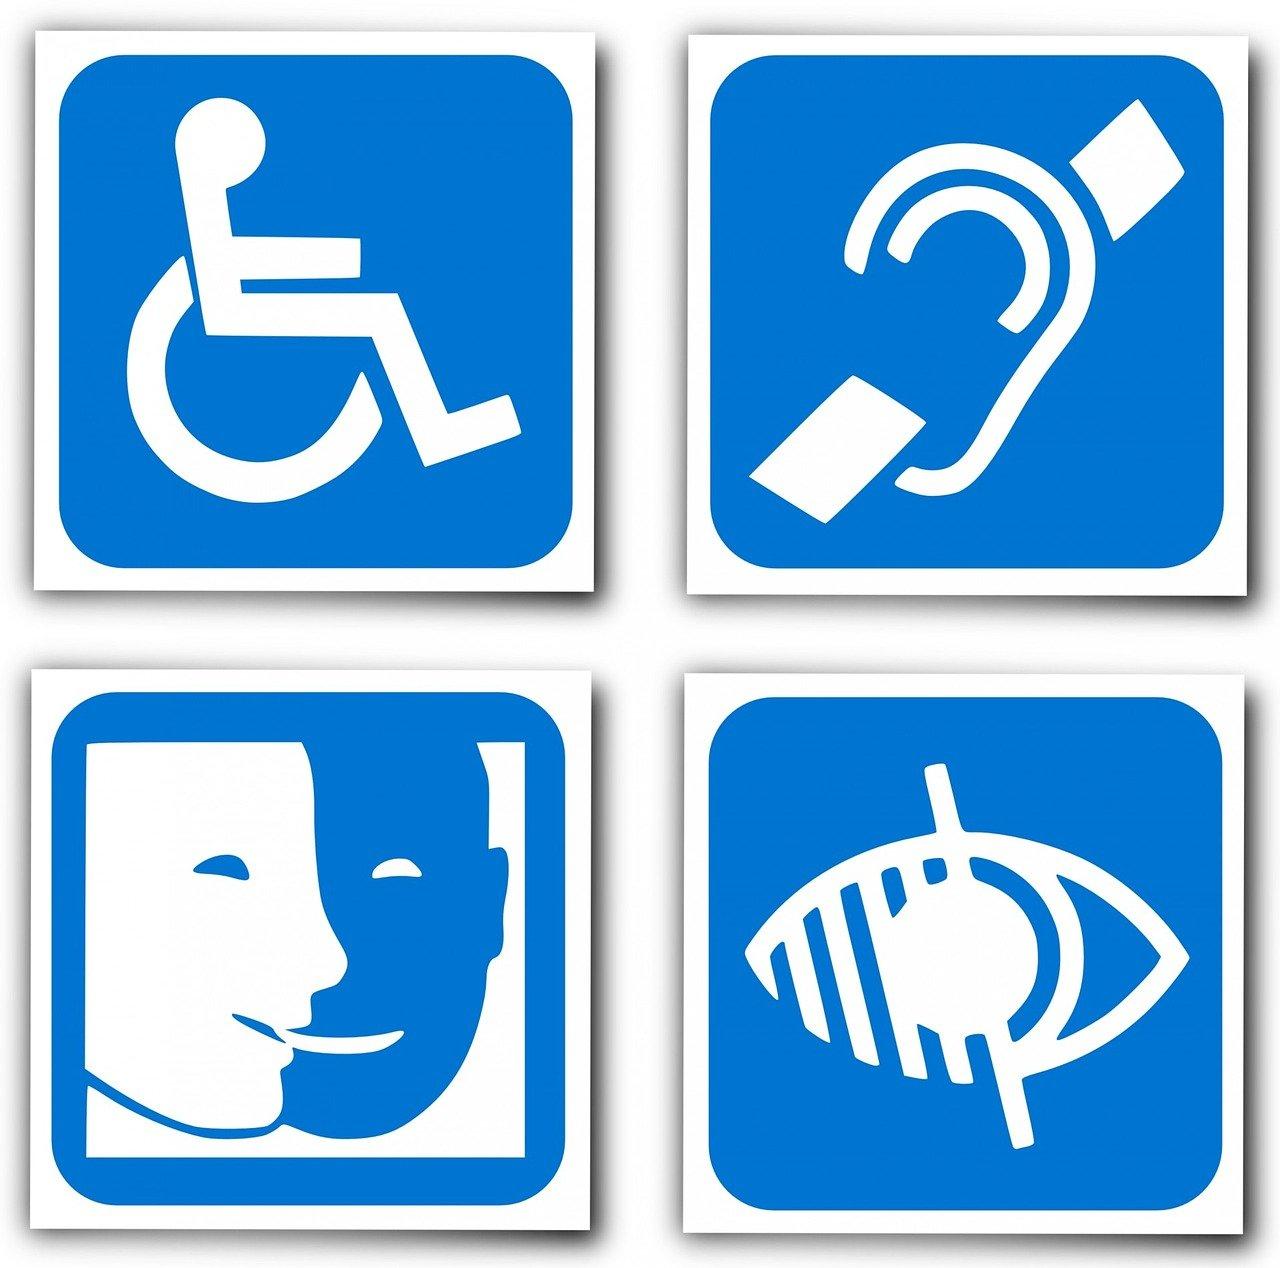 handicap-1173331_1280